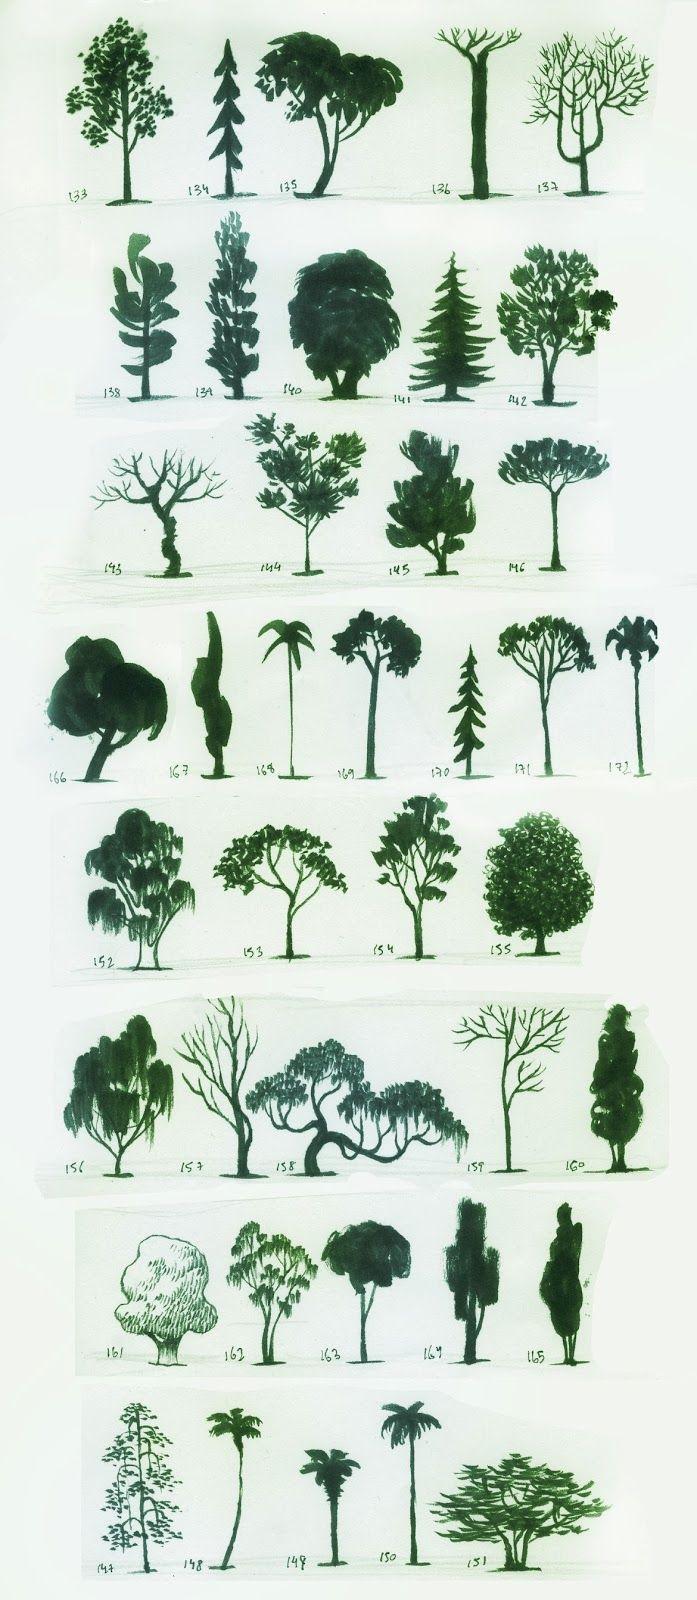 Baum Daumen